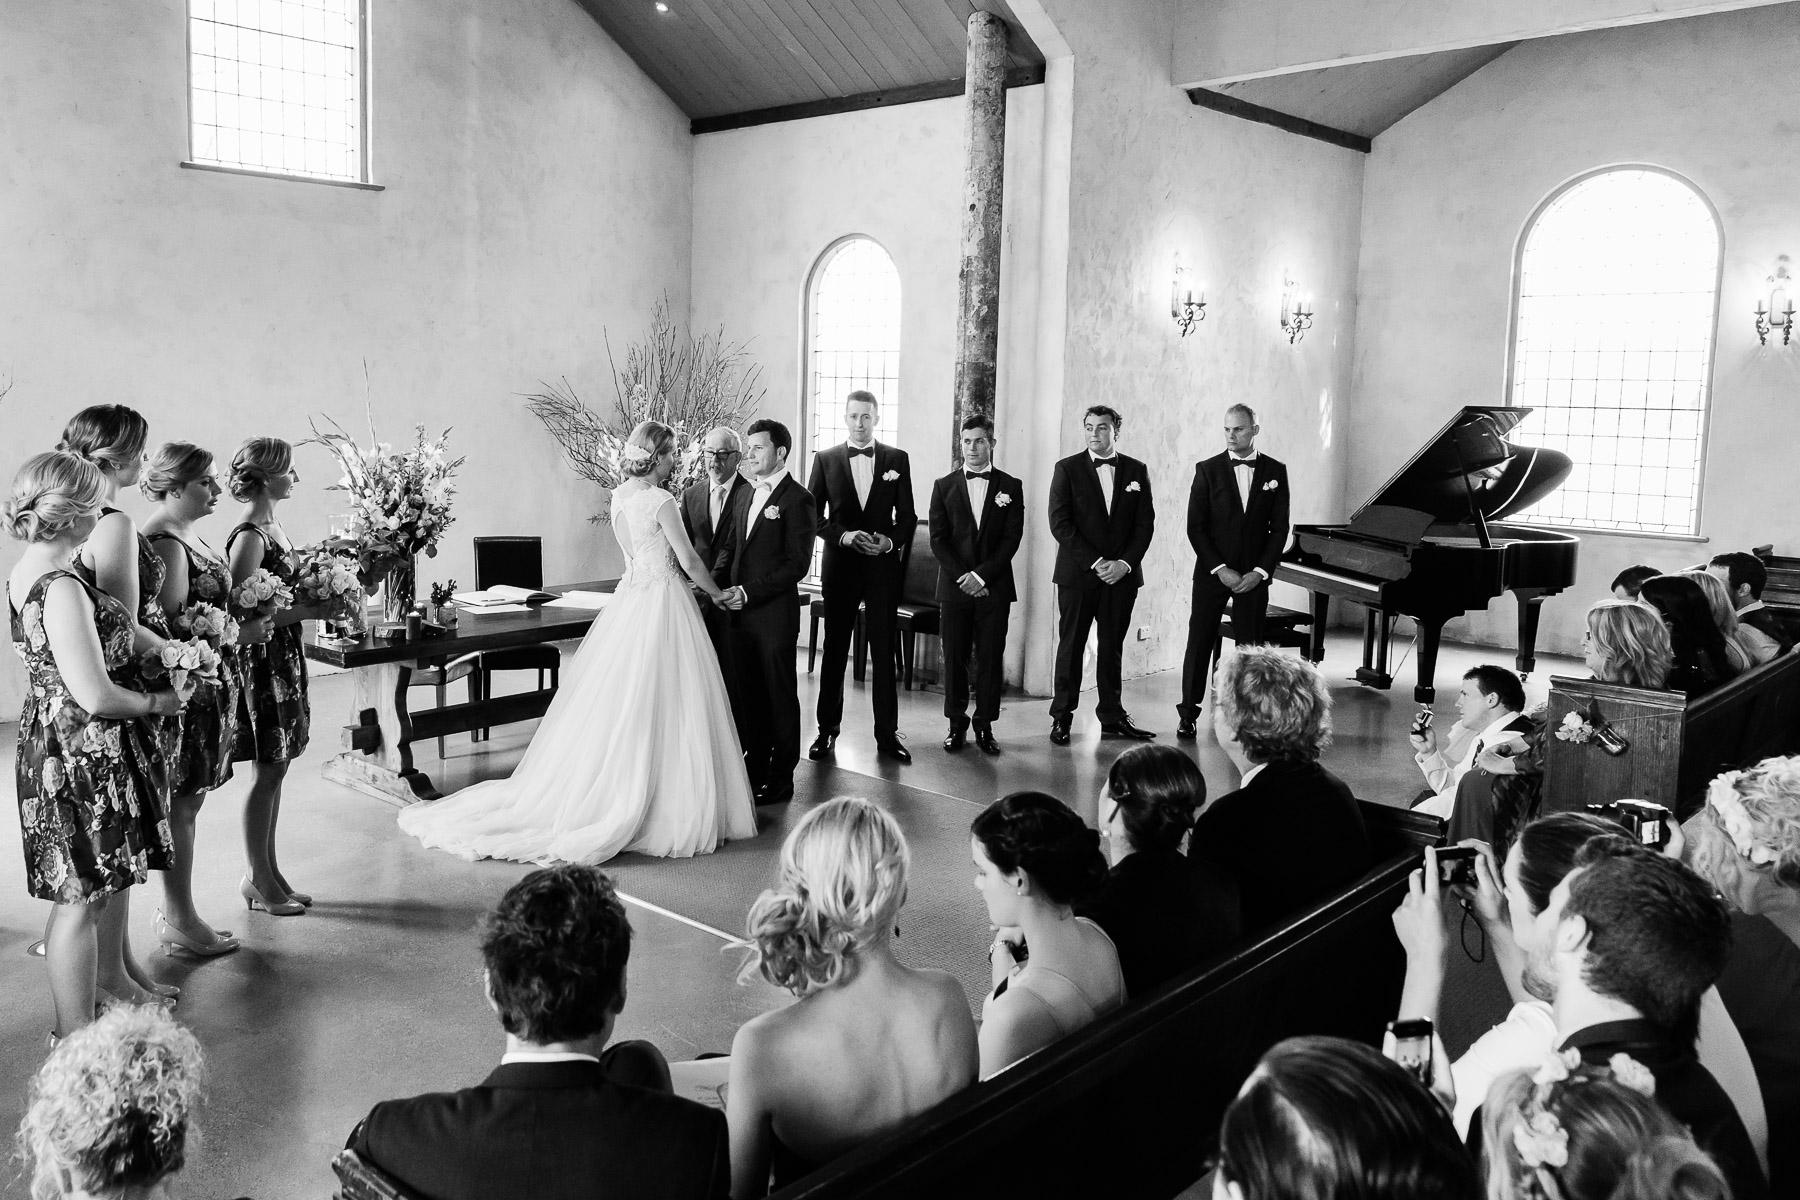 Marnie_and_Charlie_Yarra_Valley_Wedding_Blog-46.jpg